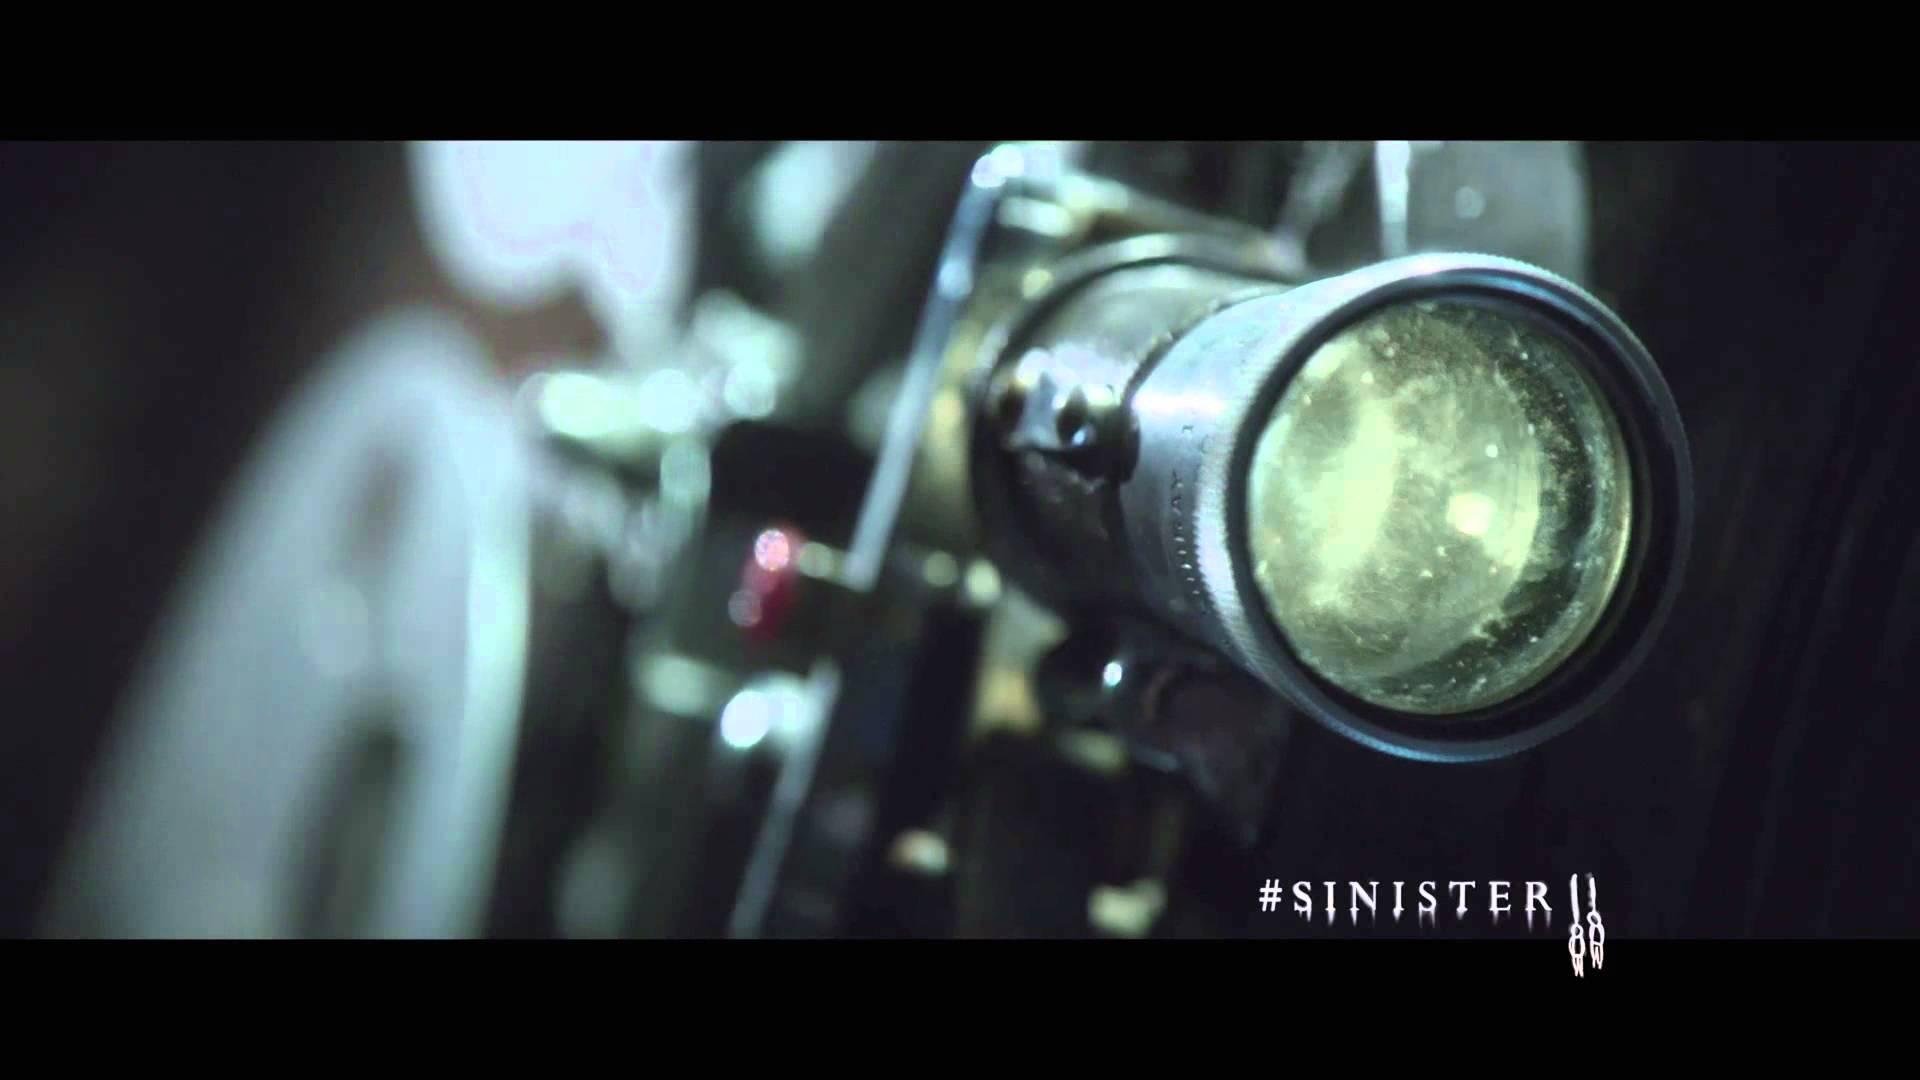 SINISTER 2 – BELIEVE TV SPOT